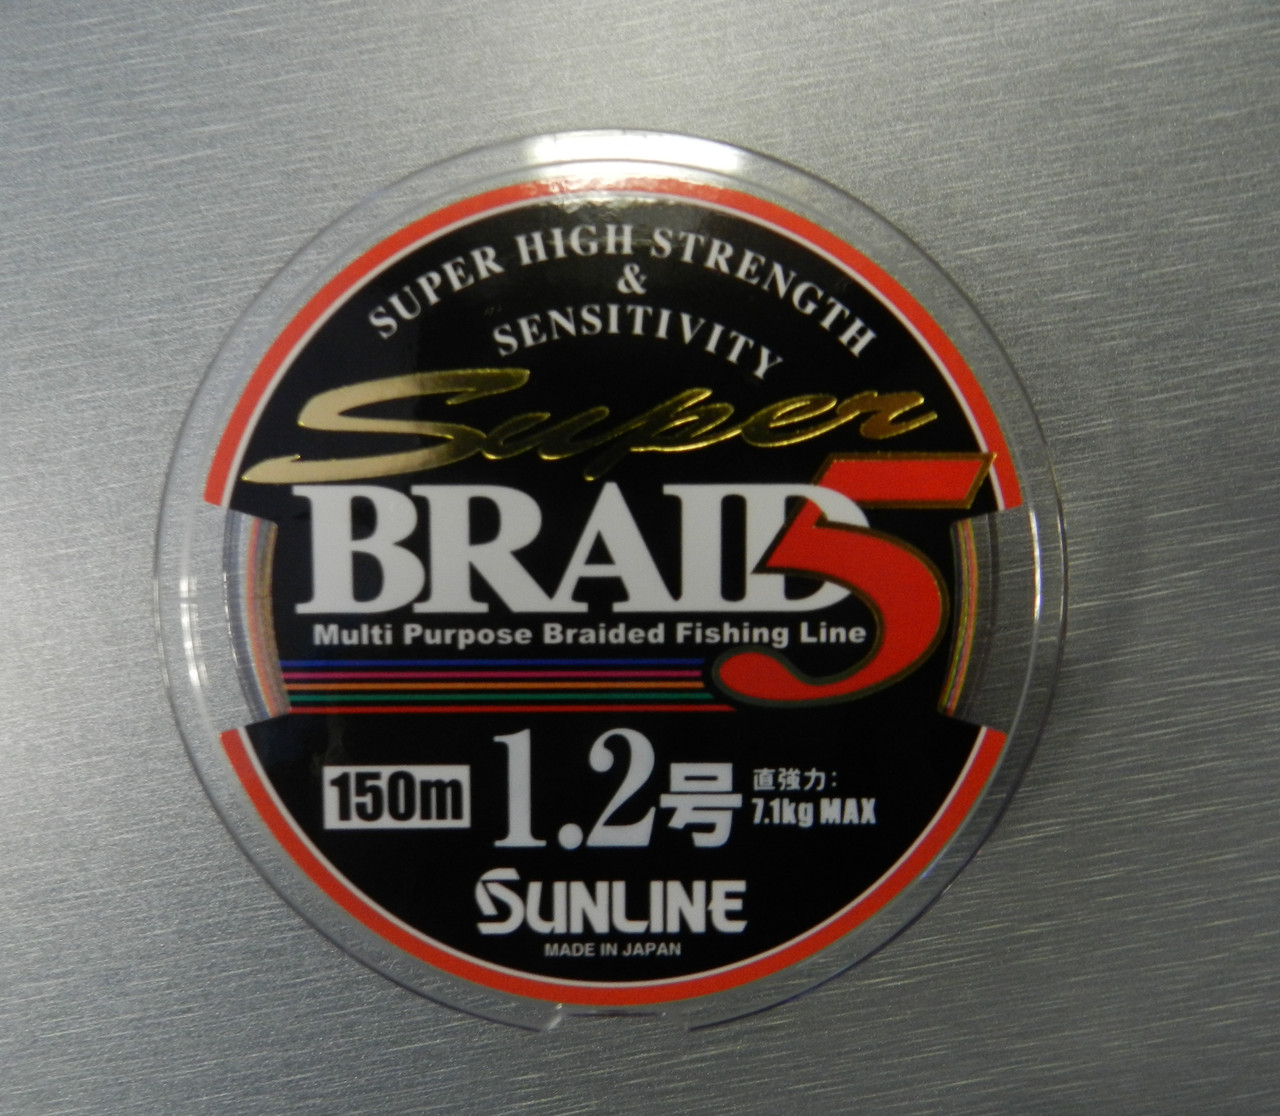 Шнур Sunline Super Braid 5 150m #1.2 0.185mm 7.1kg